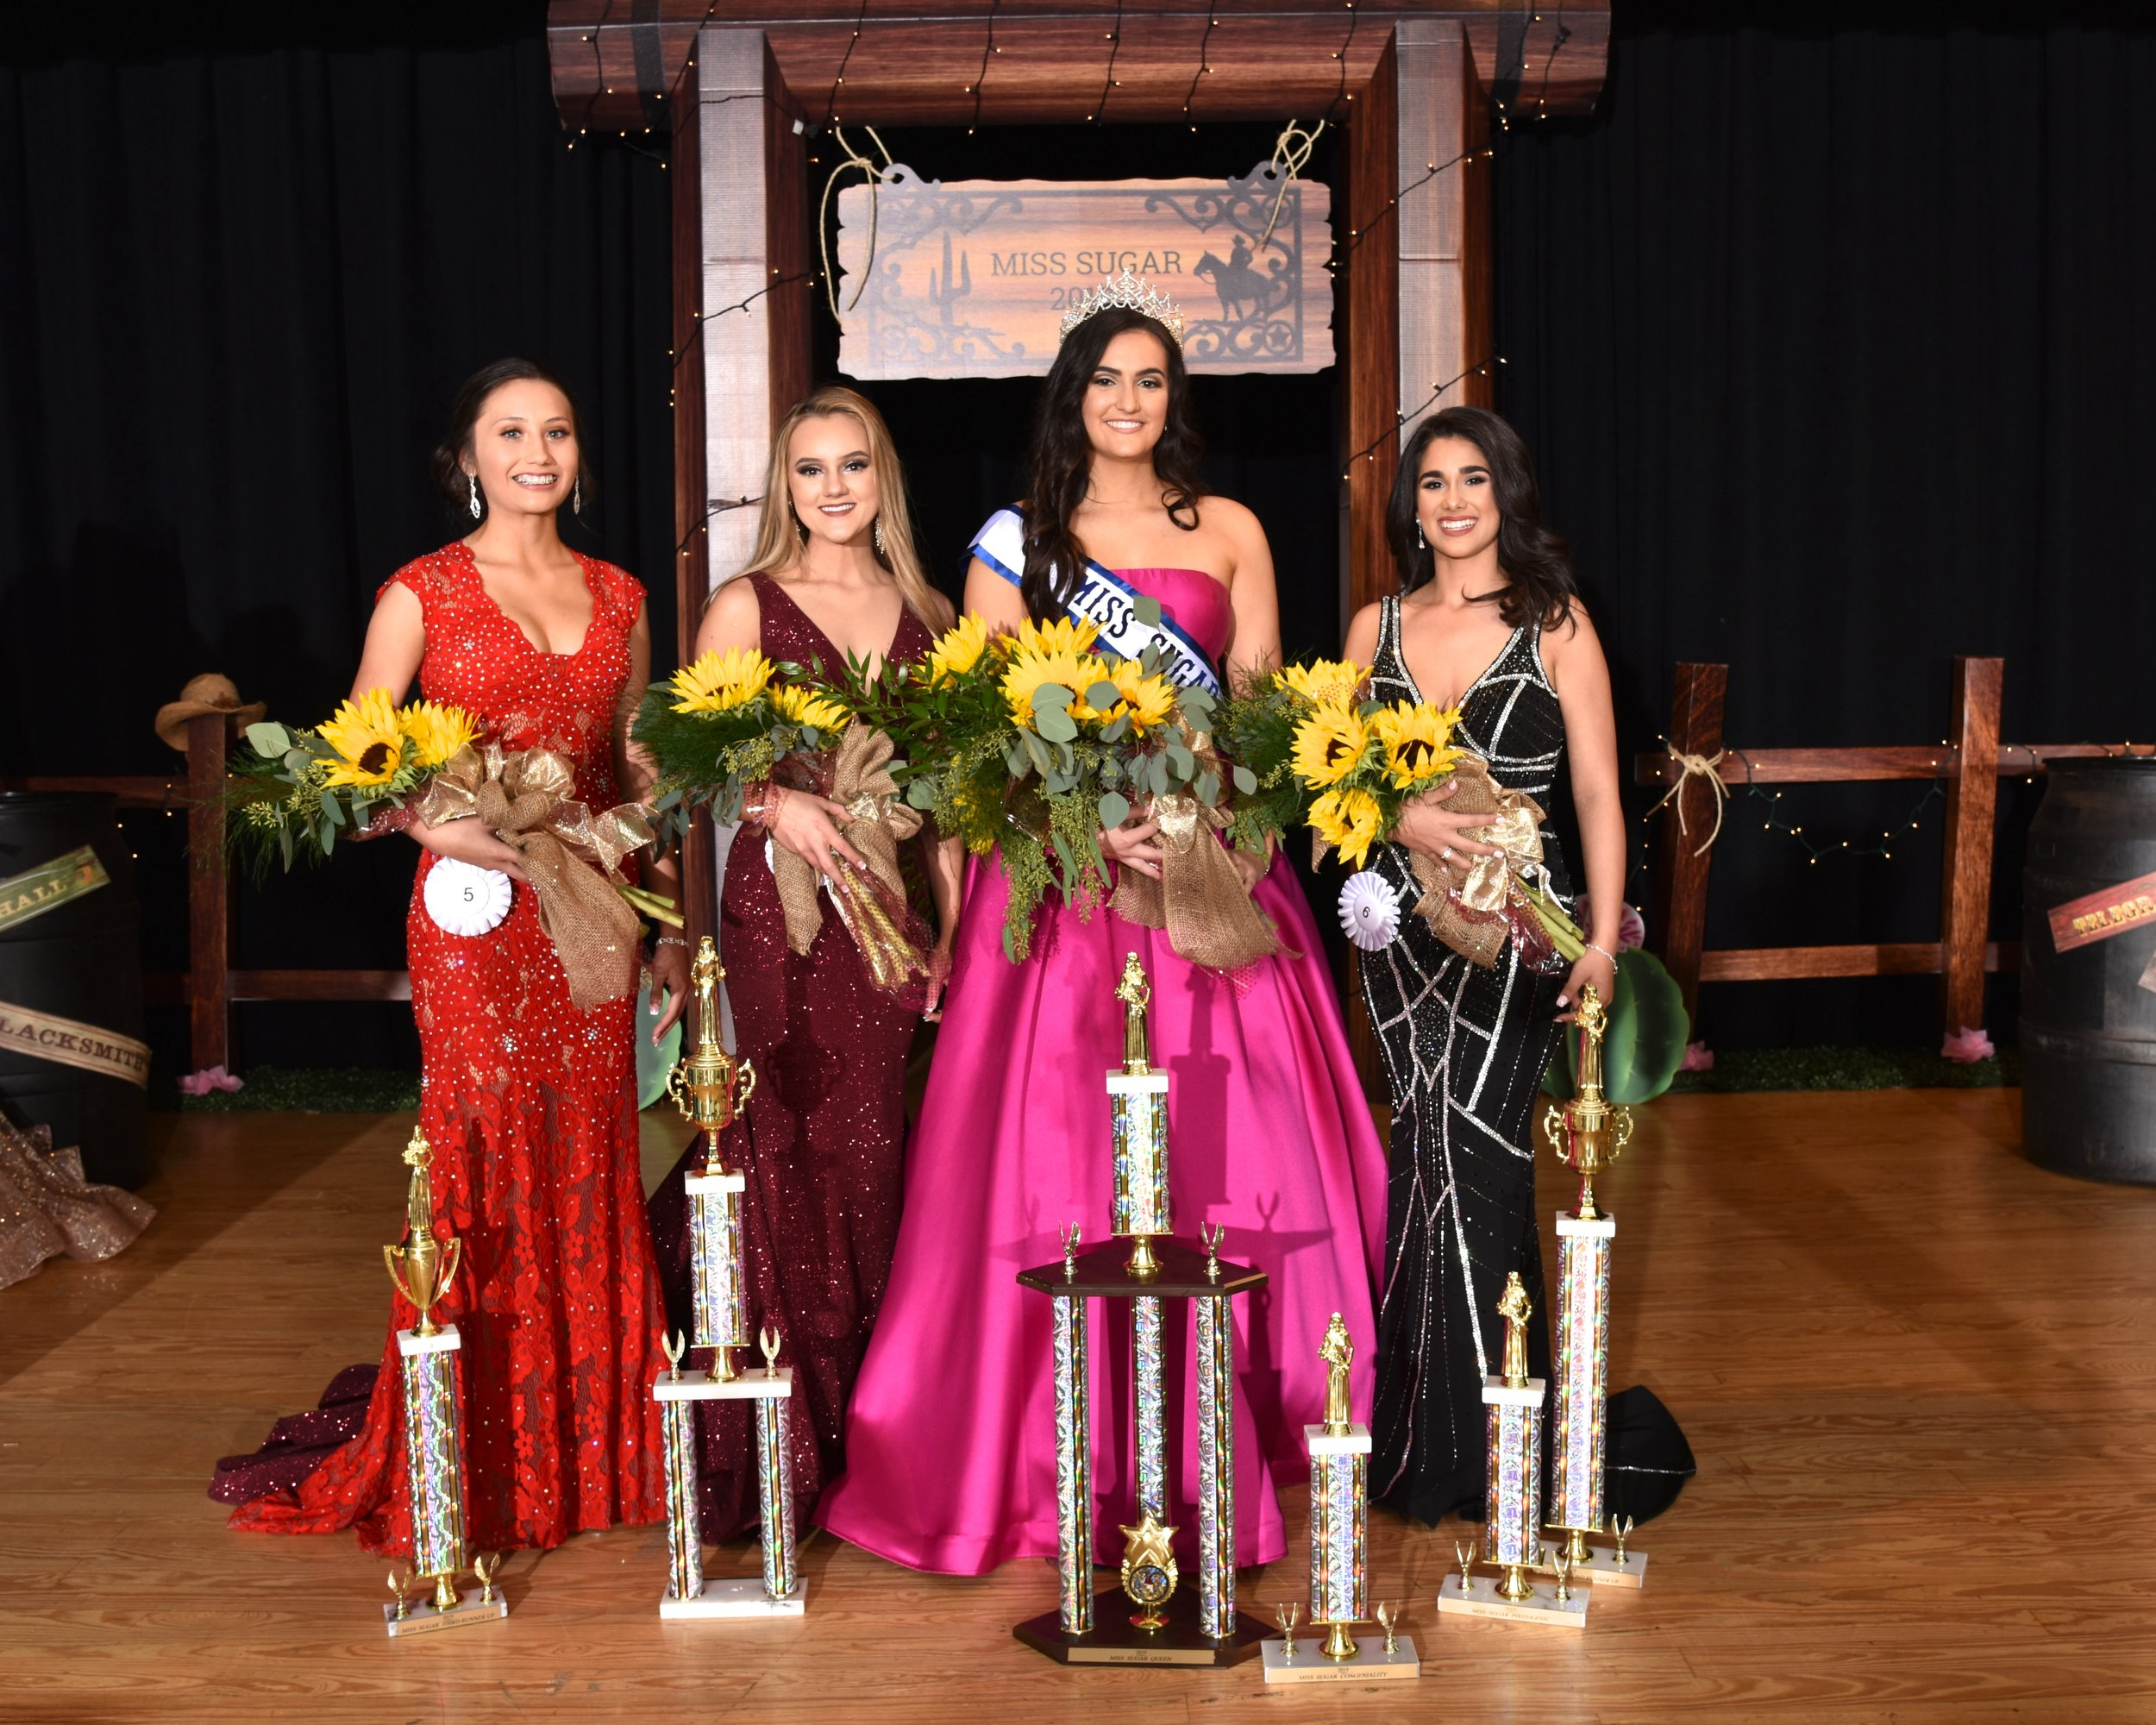 Miss Sugar 2019 Court L to R: Desiree Rudd, Caroline Sweet, Melissa Manning, Morgan Sherman